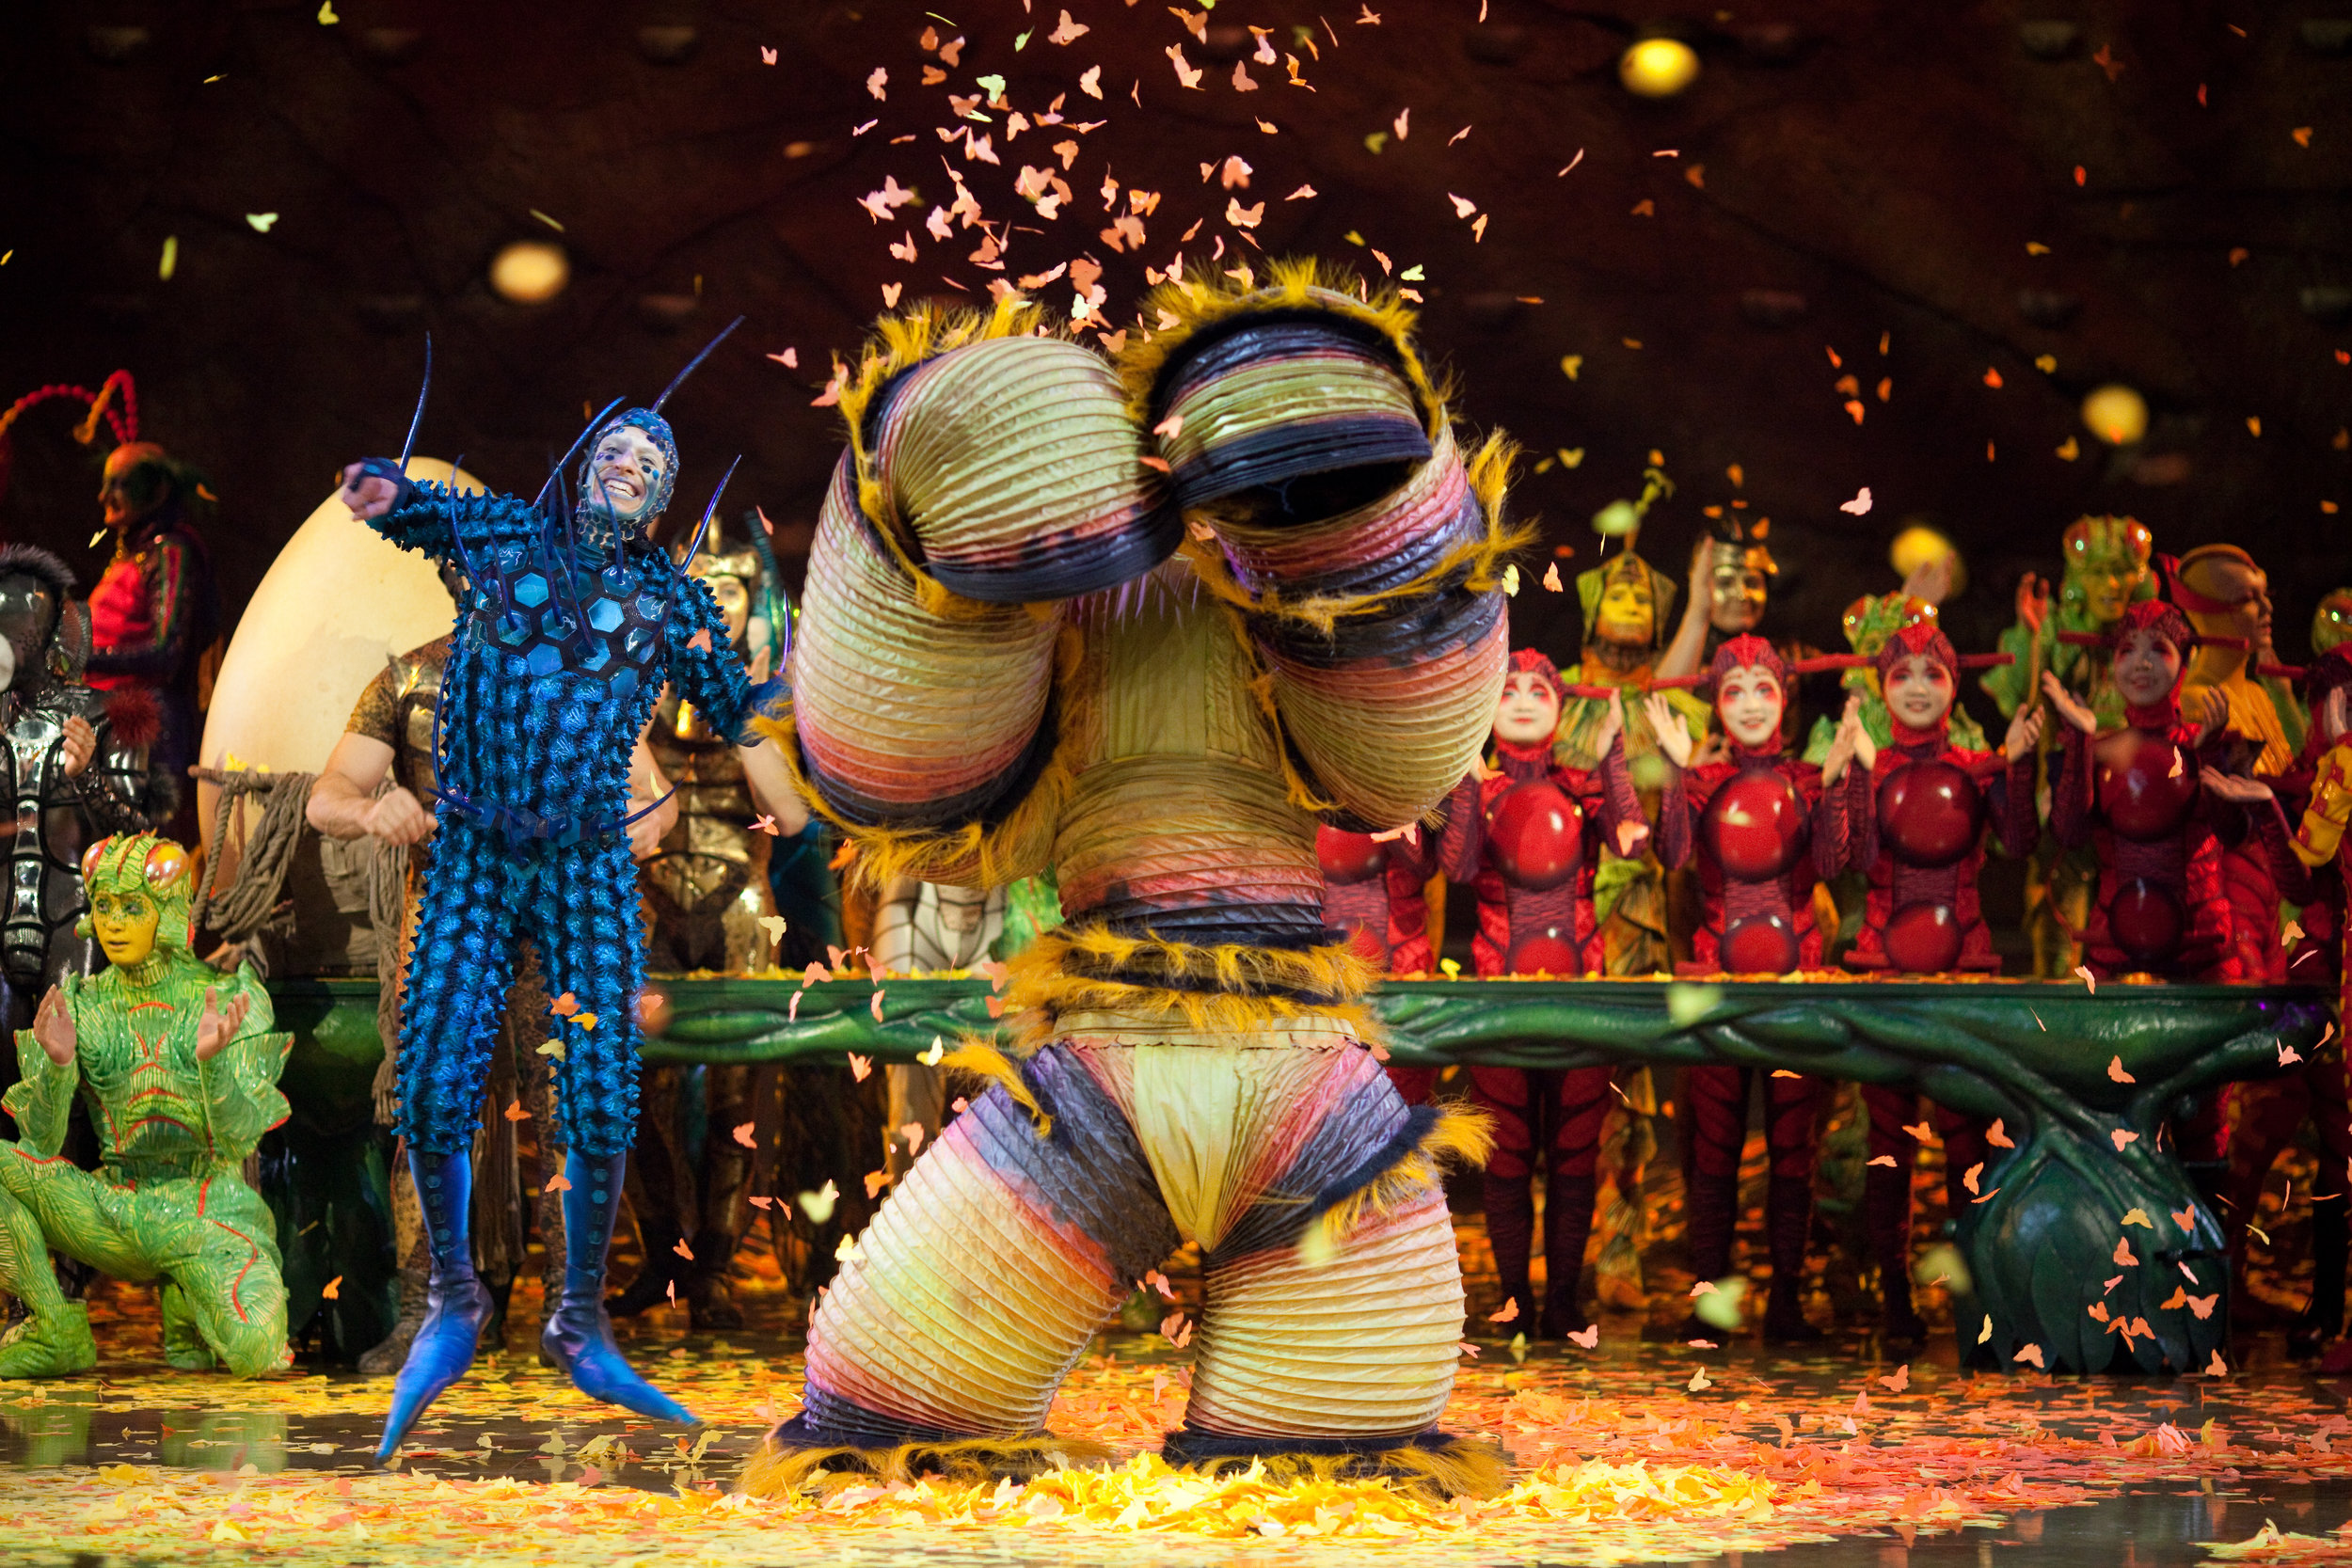 Photo: OSA Images Costumes: Liz Vandal © 2009 Cirque du Soleil